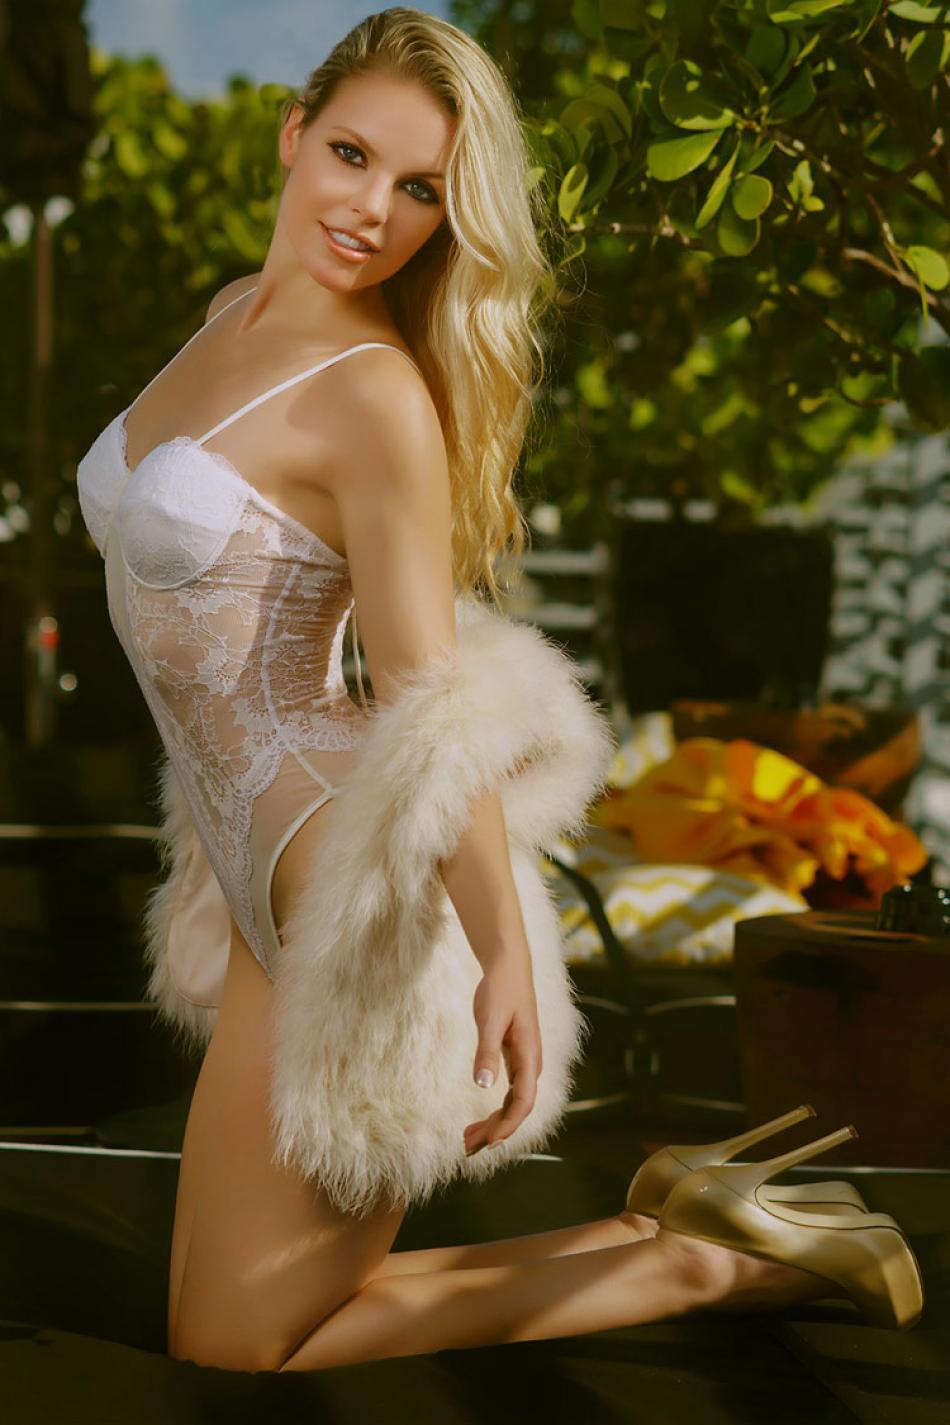 Ladyfordaddy.com Agnes Girl In New York 02065524 - 7 7